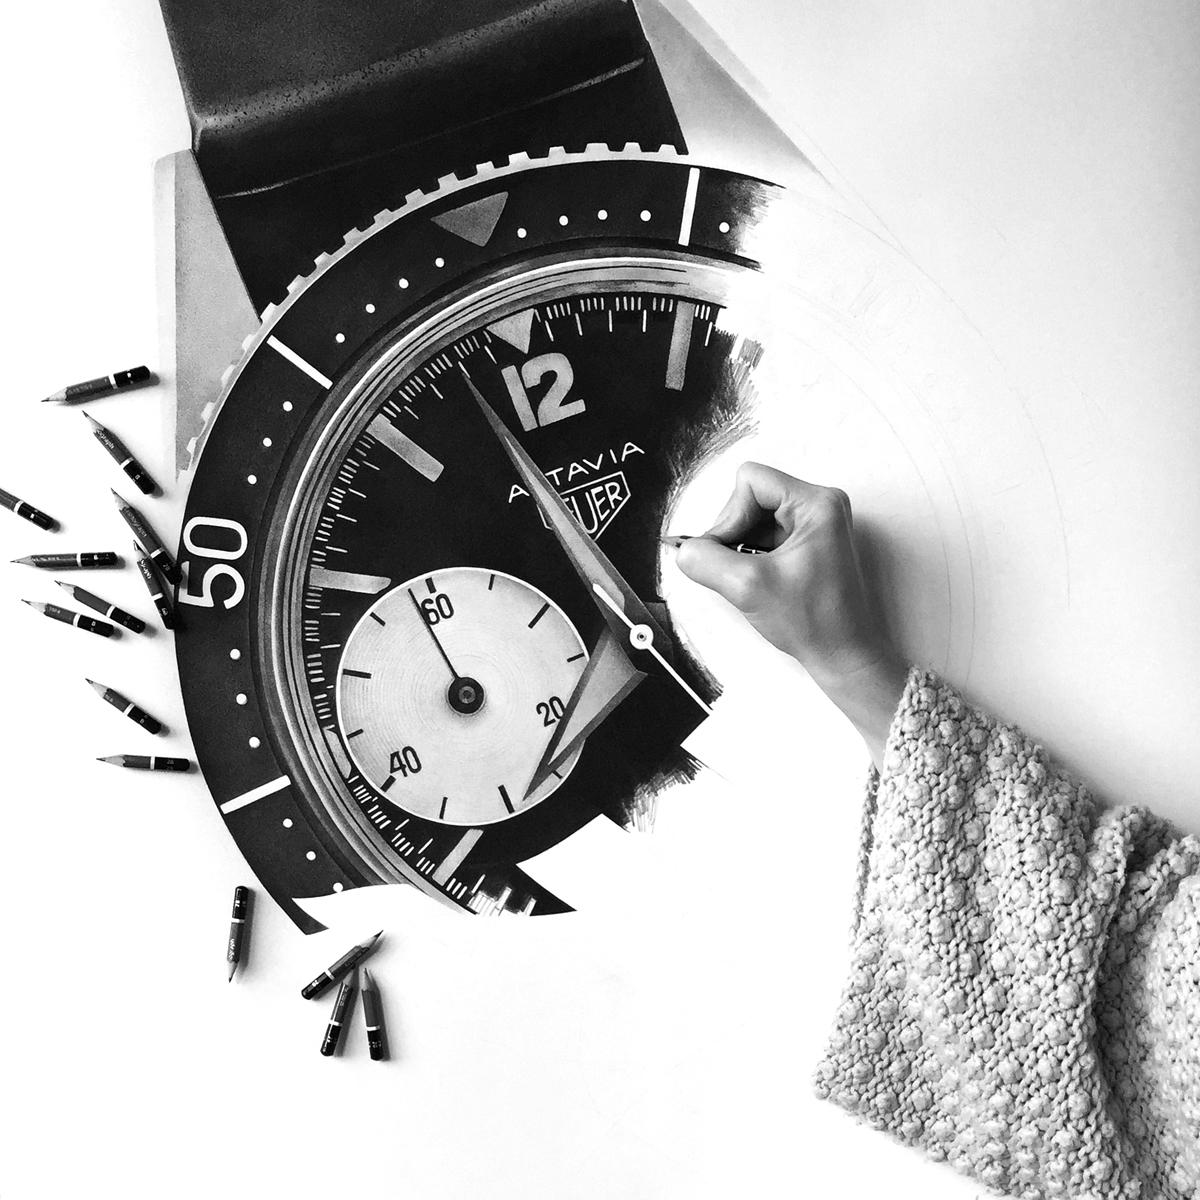 jkai timepieces